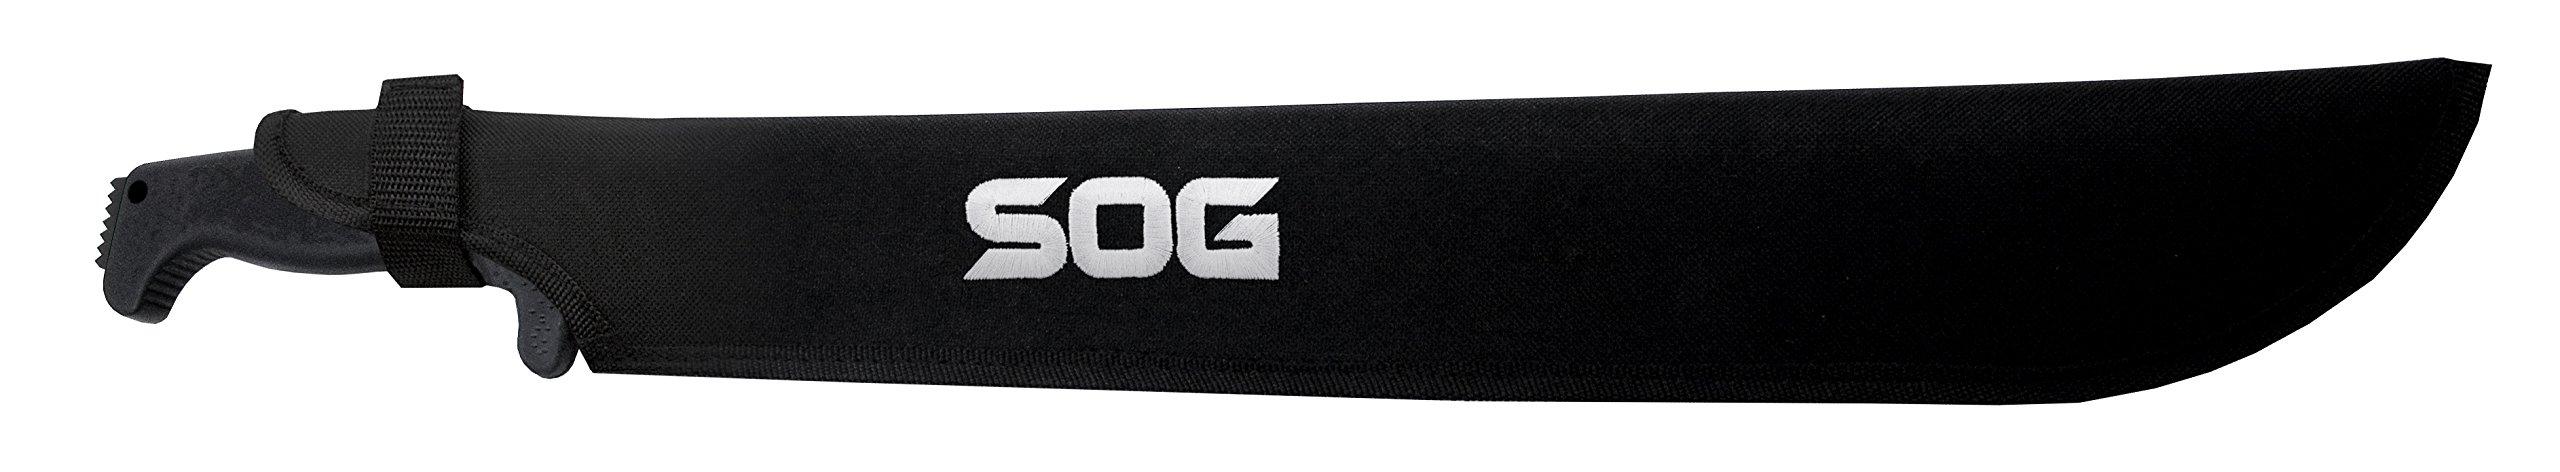 SOG SOGfari 18'' Machete MC02-N - Hardcased Black Blade w/Saw Back, Rubber Handle, Nylon Sheath